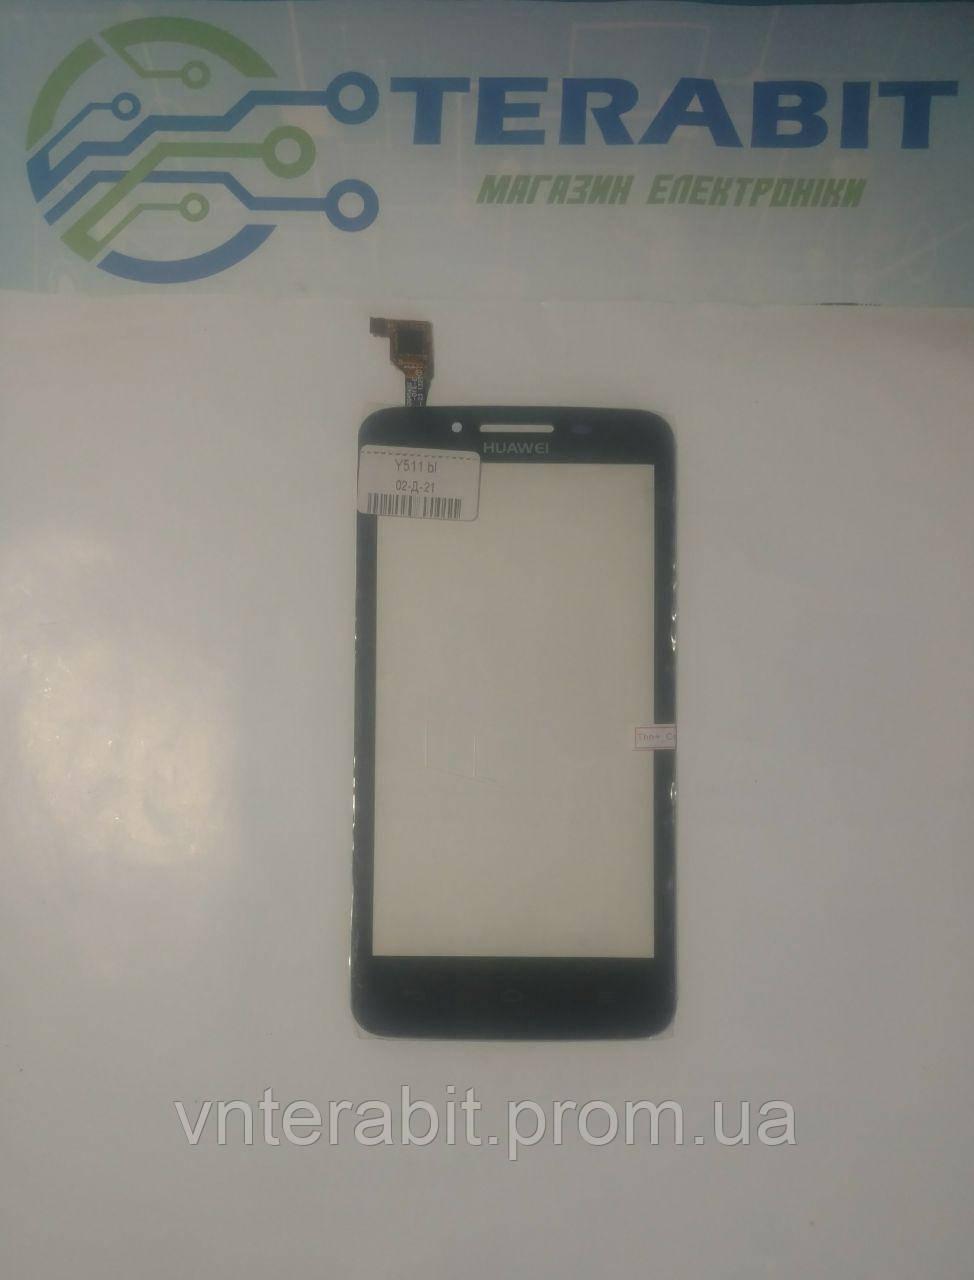 Тачскрин (сенсор) для Huawei Y511